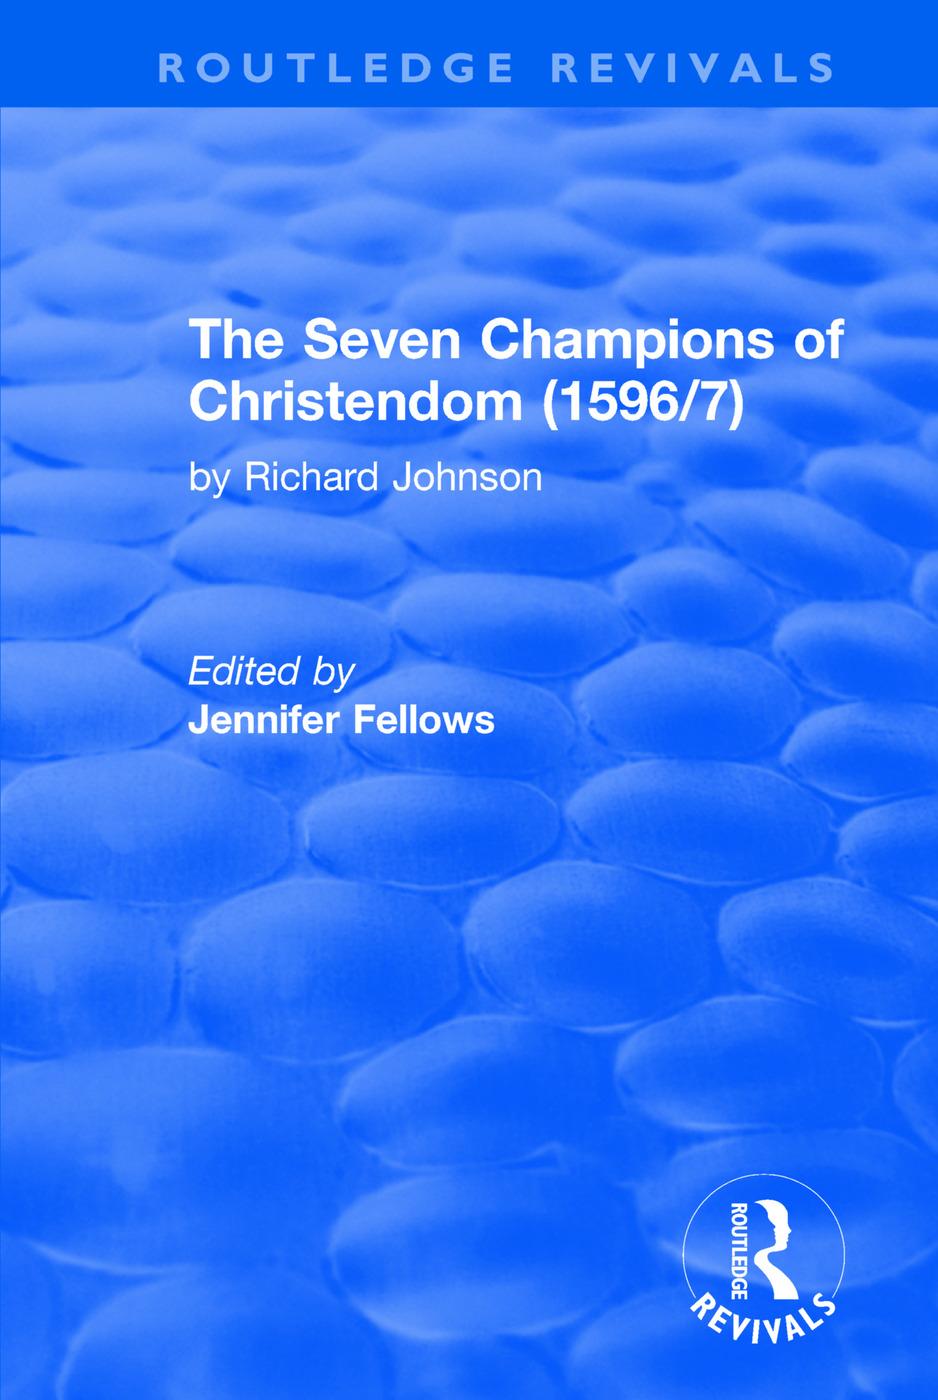 The Seven Champions of Christendom (1596/7): The Seven Champions of Christendom